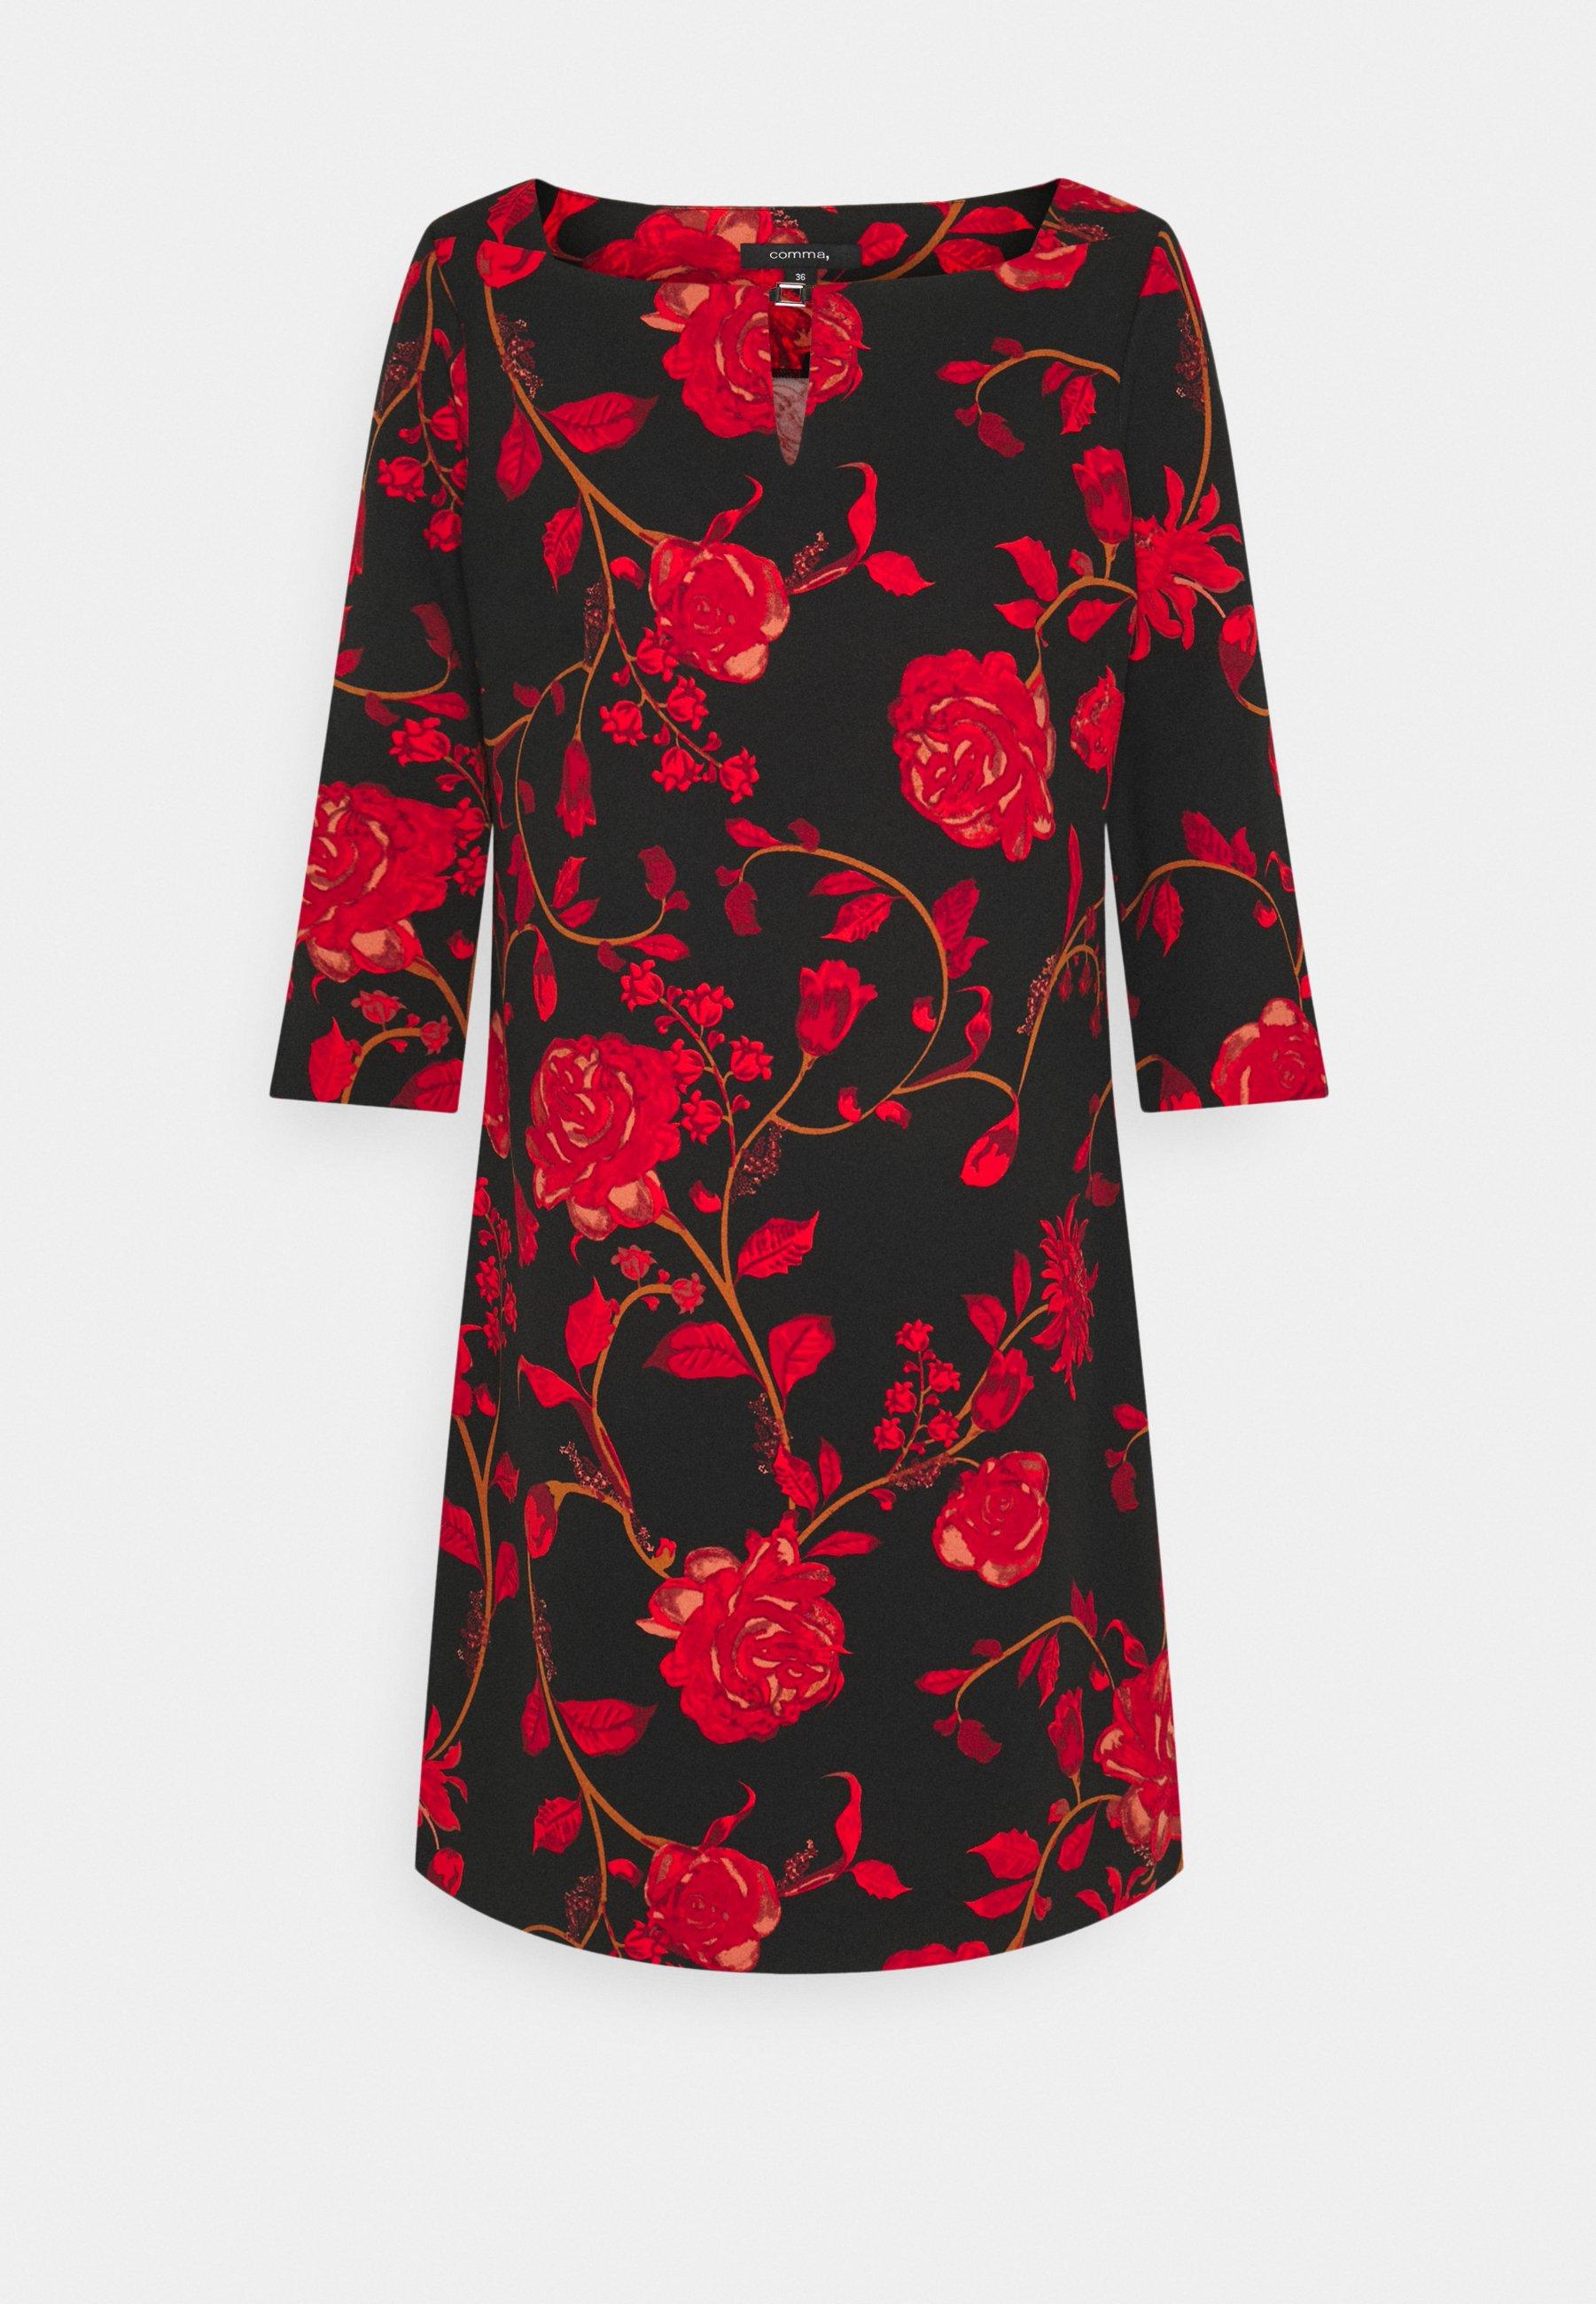 kleid kurz - freizeitkleid - black red